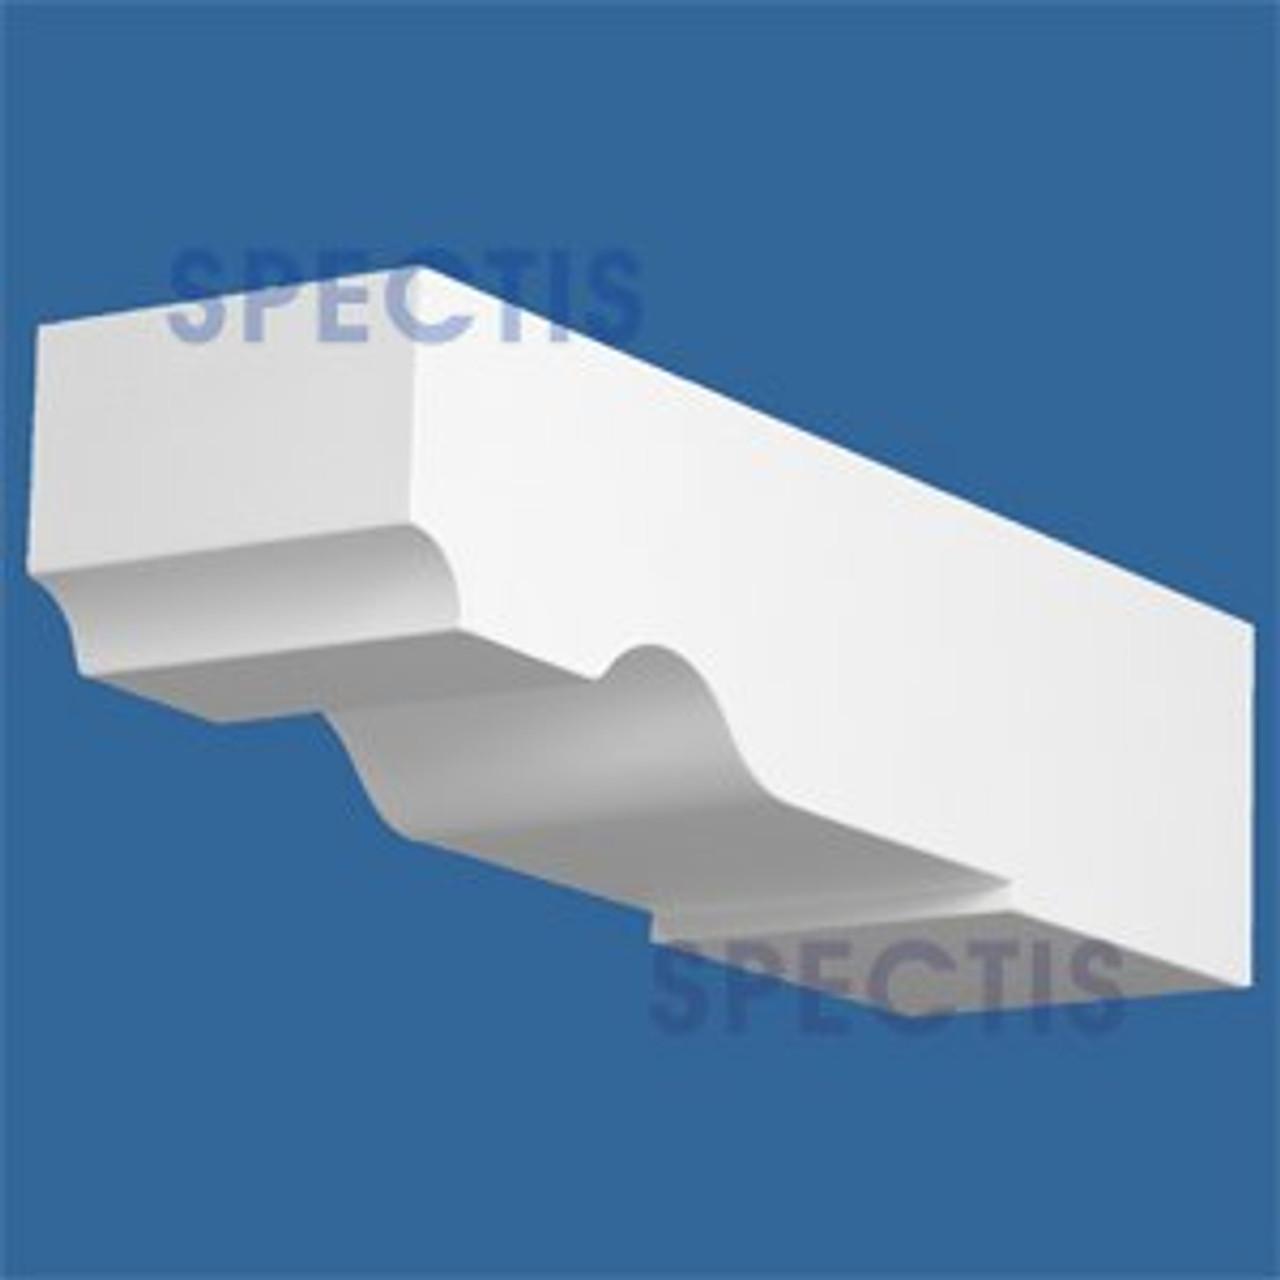 "BL2843 Corbel Block or Eave Bracket 4""W x 3.75""H x 14"" P"